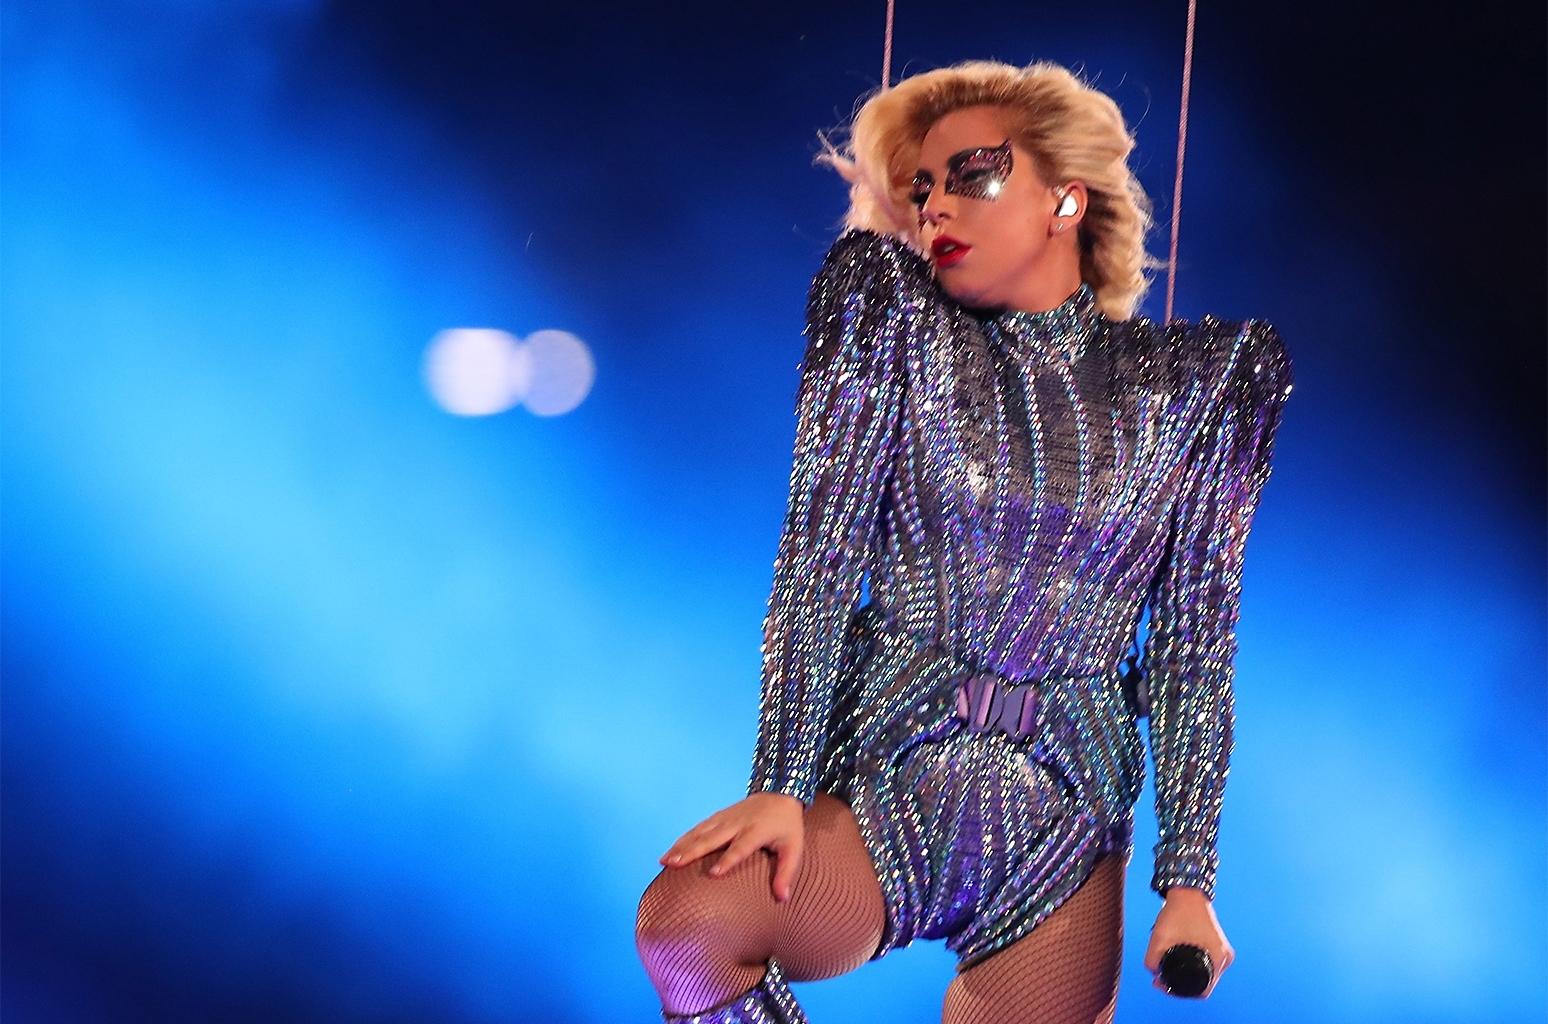 Lady Gaga's Super Bowl Roof Jump & Drones Were Pre-Recorded regarding Lady Gaga Super Bowl 2018